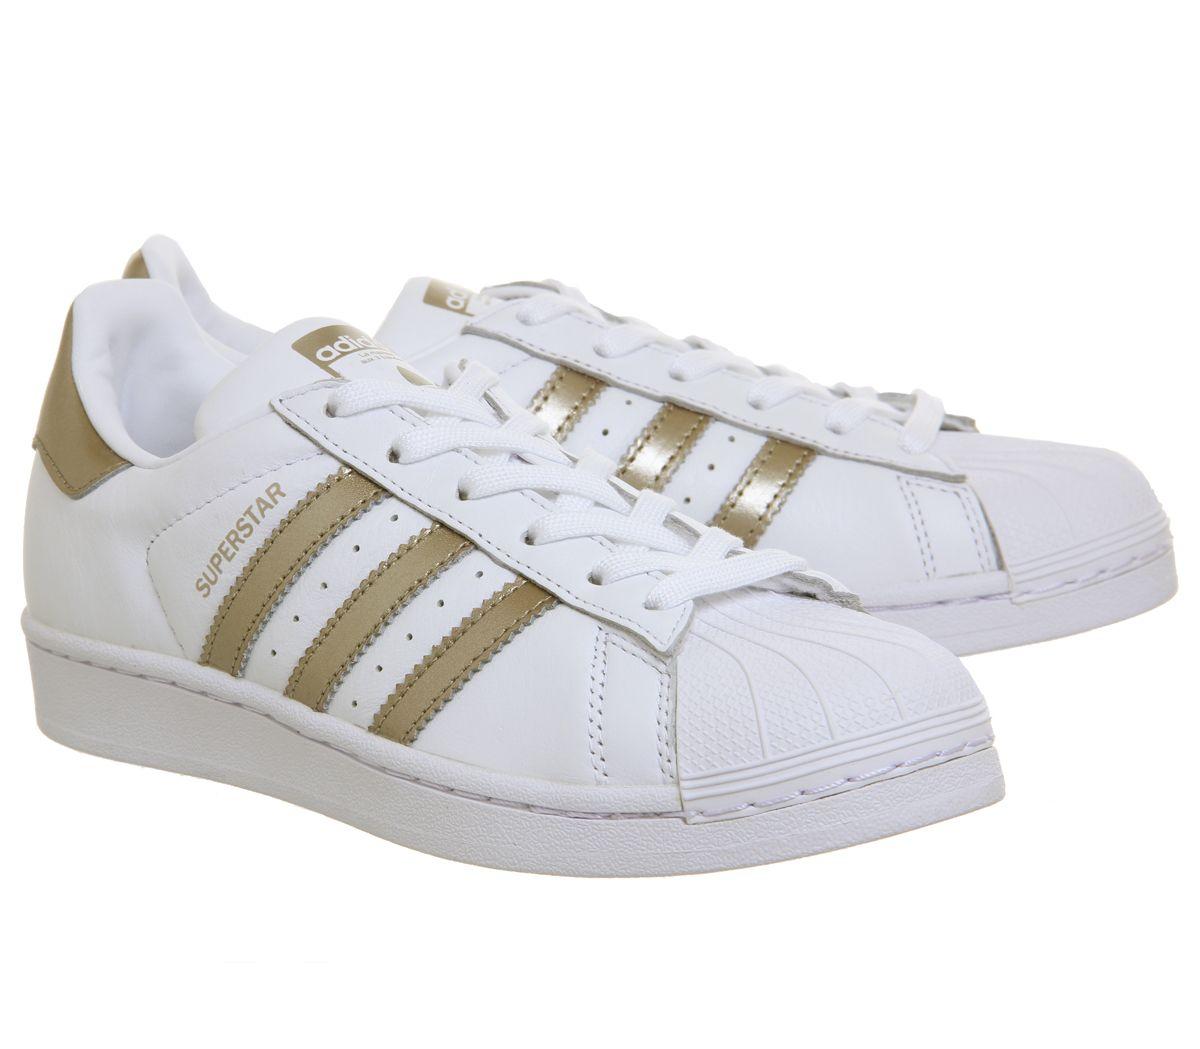 Détails sur Femmes Adidas Superstar 1 Chaussures Blanches Métallique Baskets